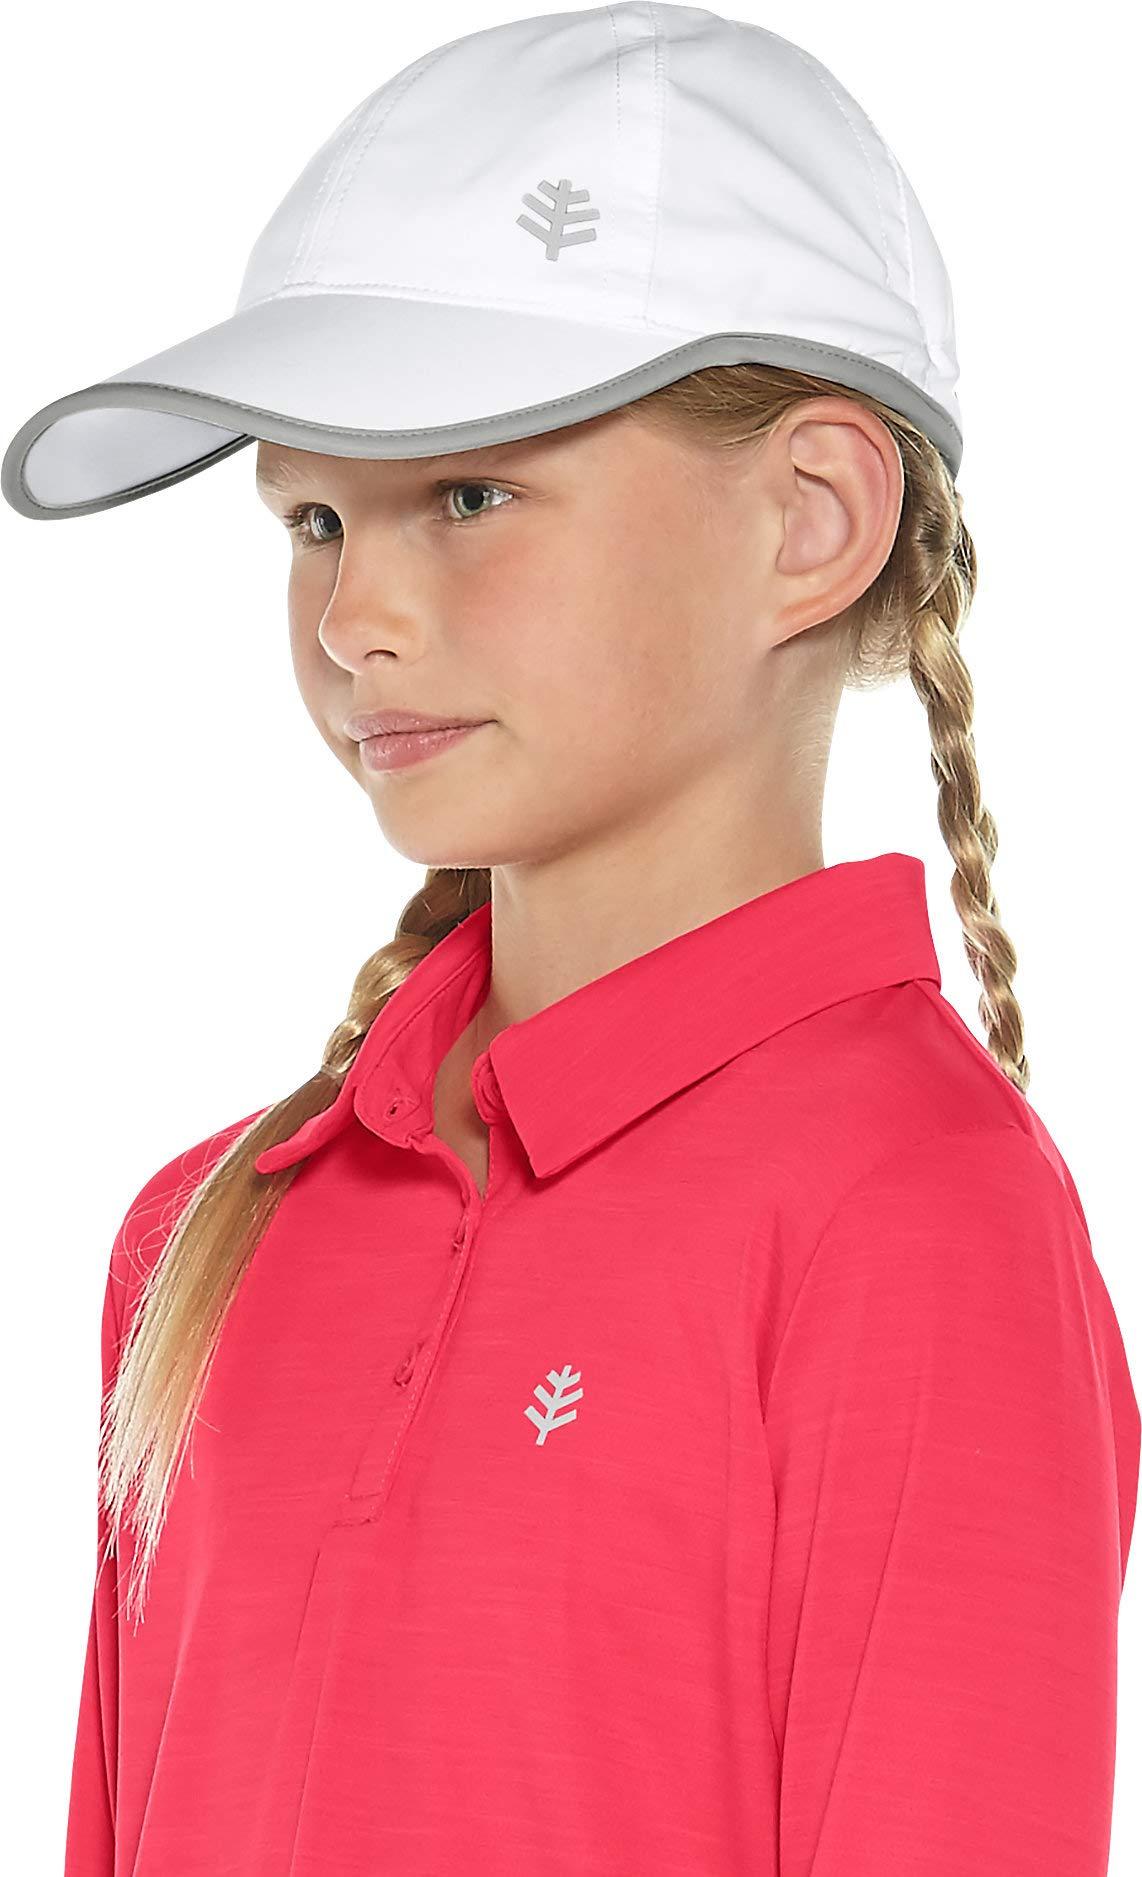 Coolibar UPF 50+ Kids' Sport Cap - Sun Protective (Small/Medium- White/Silver)